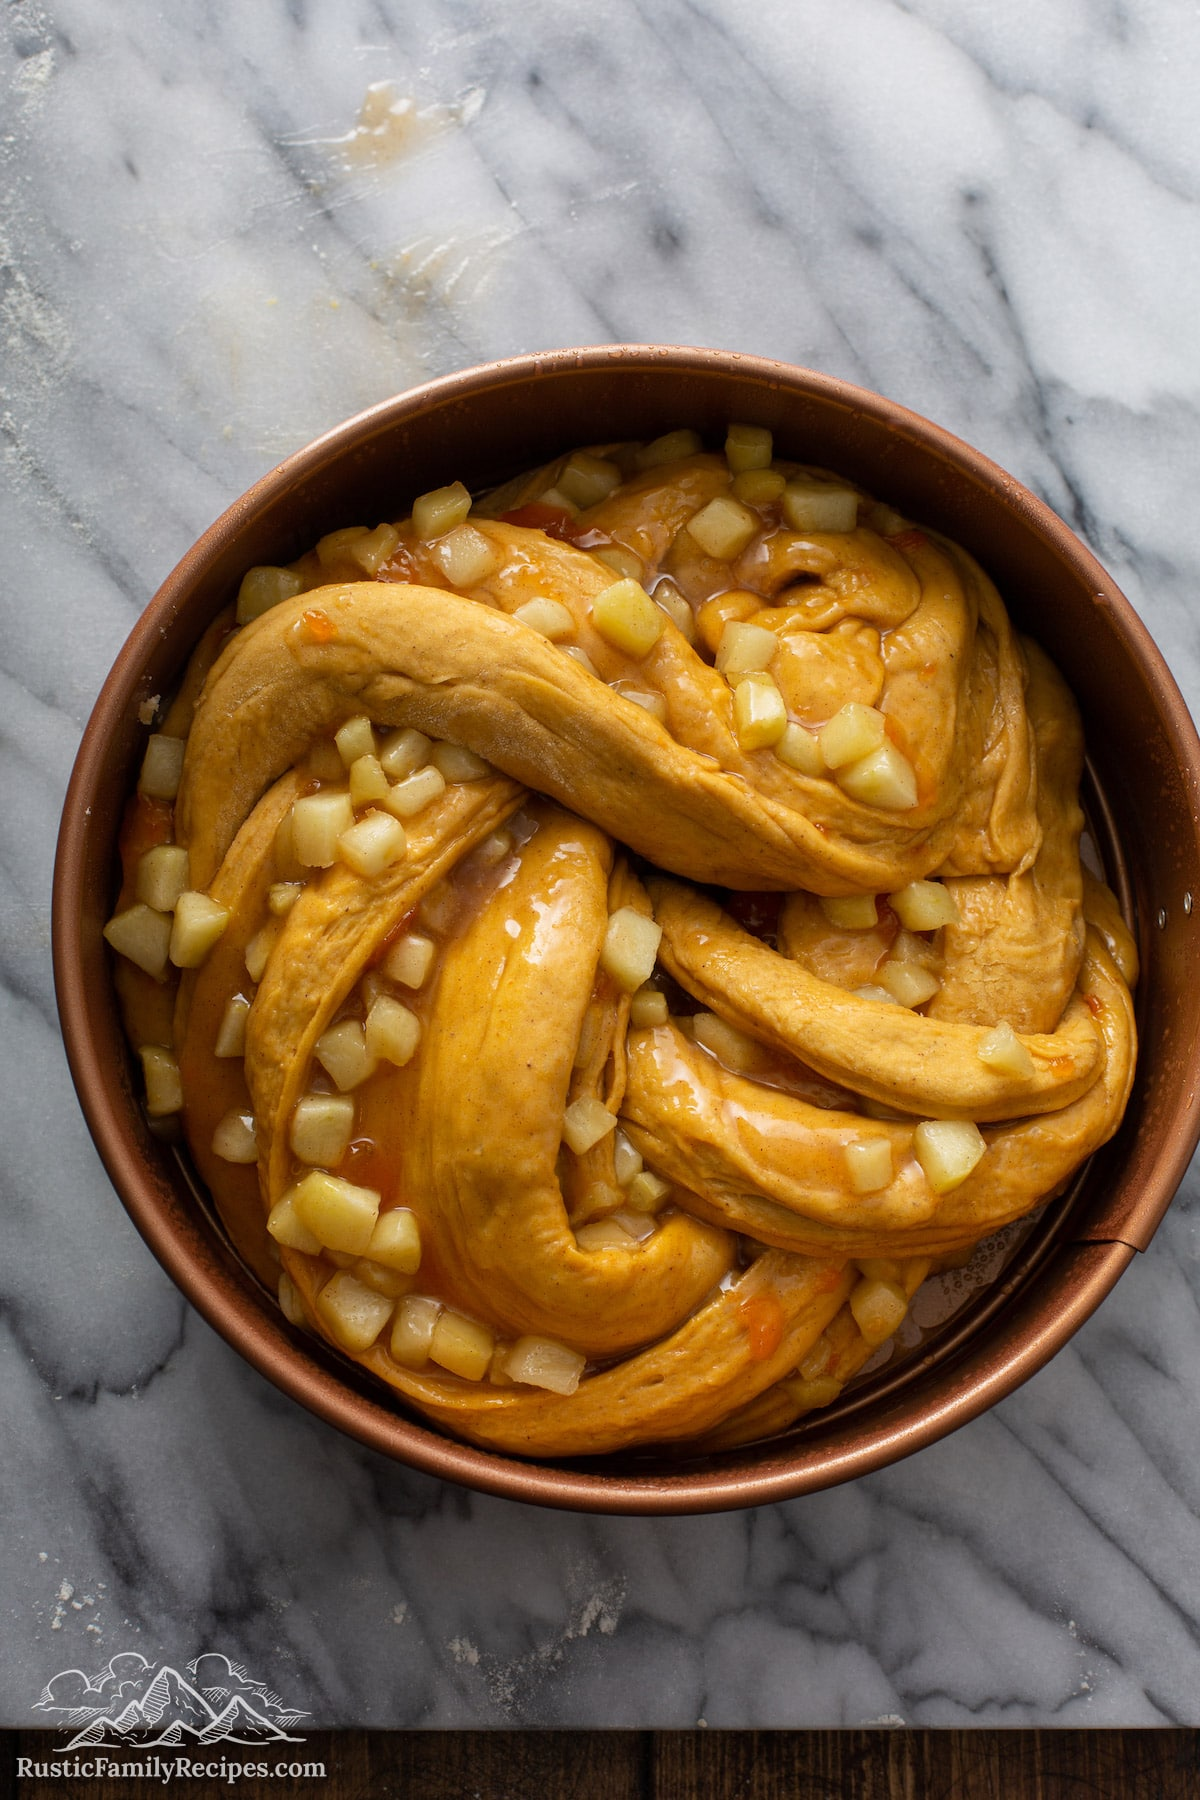 Pumpkin Apple Apricot Bread dough in pan